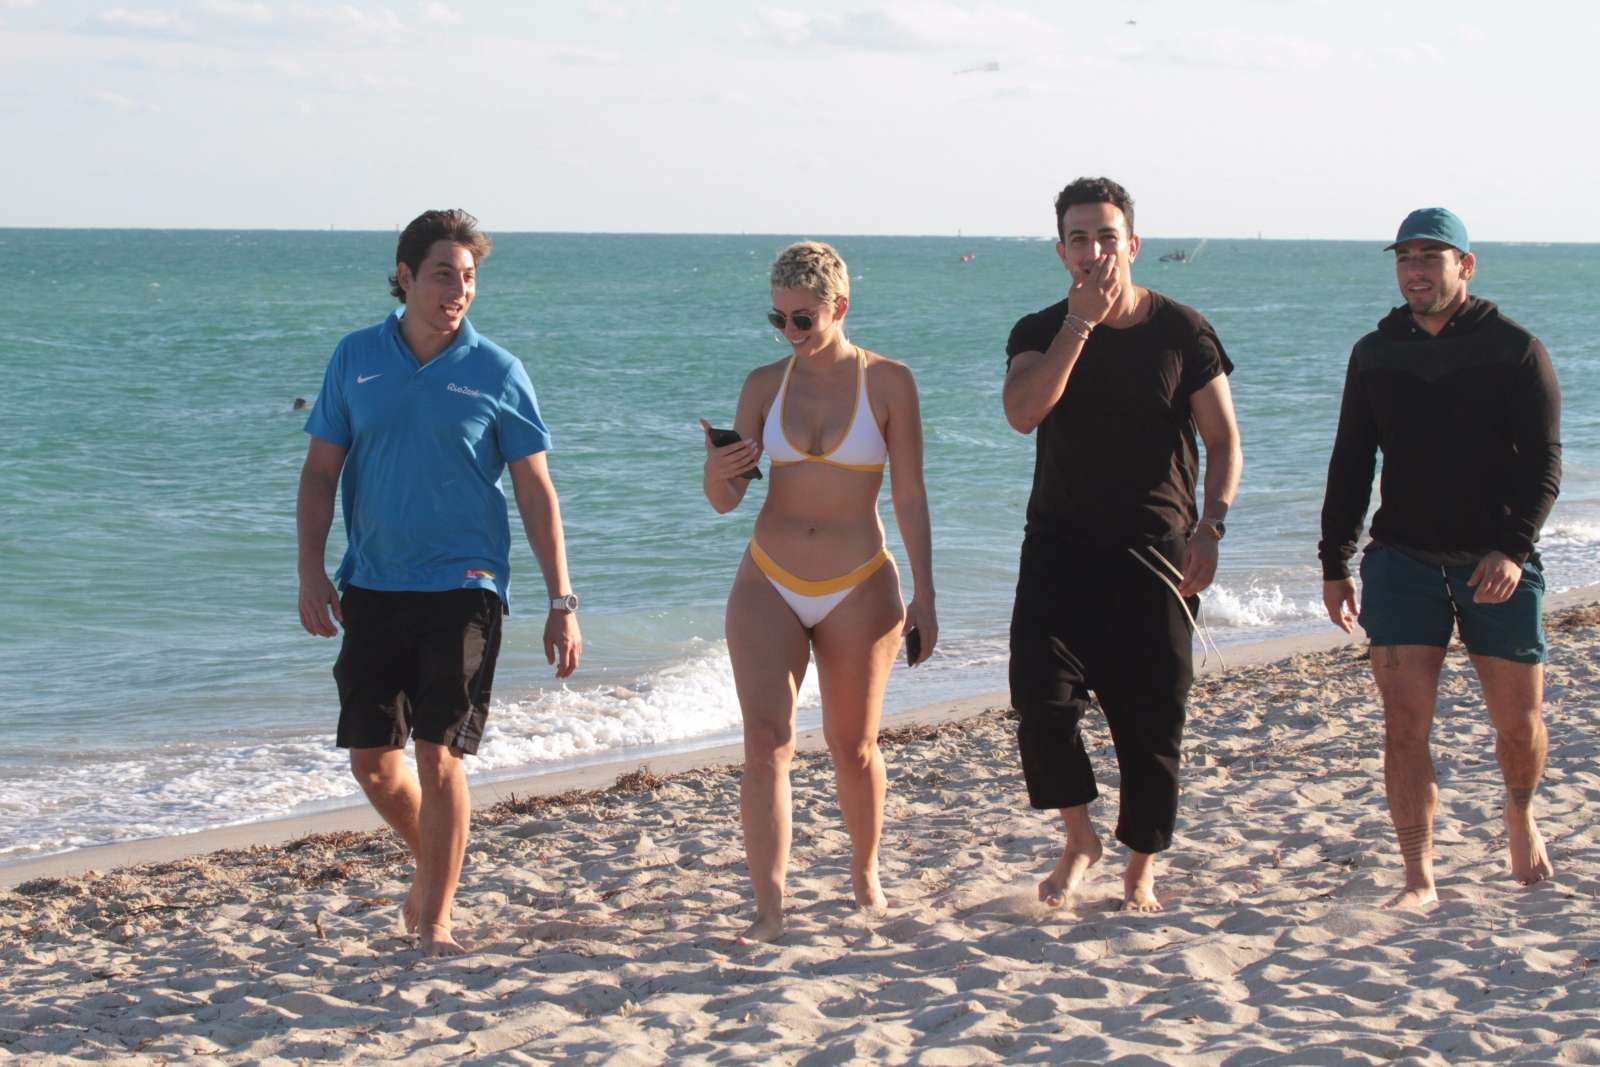 YesJulz in White Bikini on the beach in Miami Pic 6 of 35